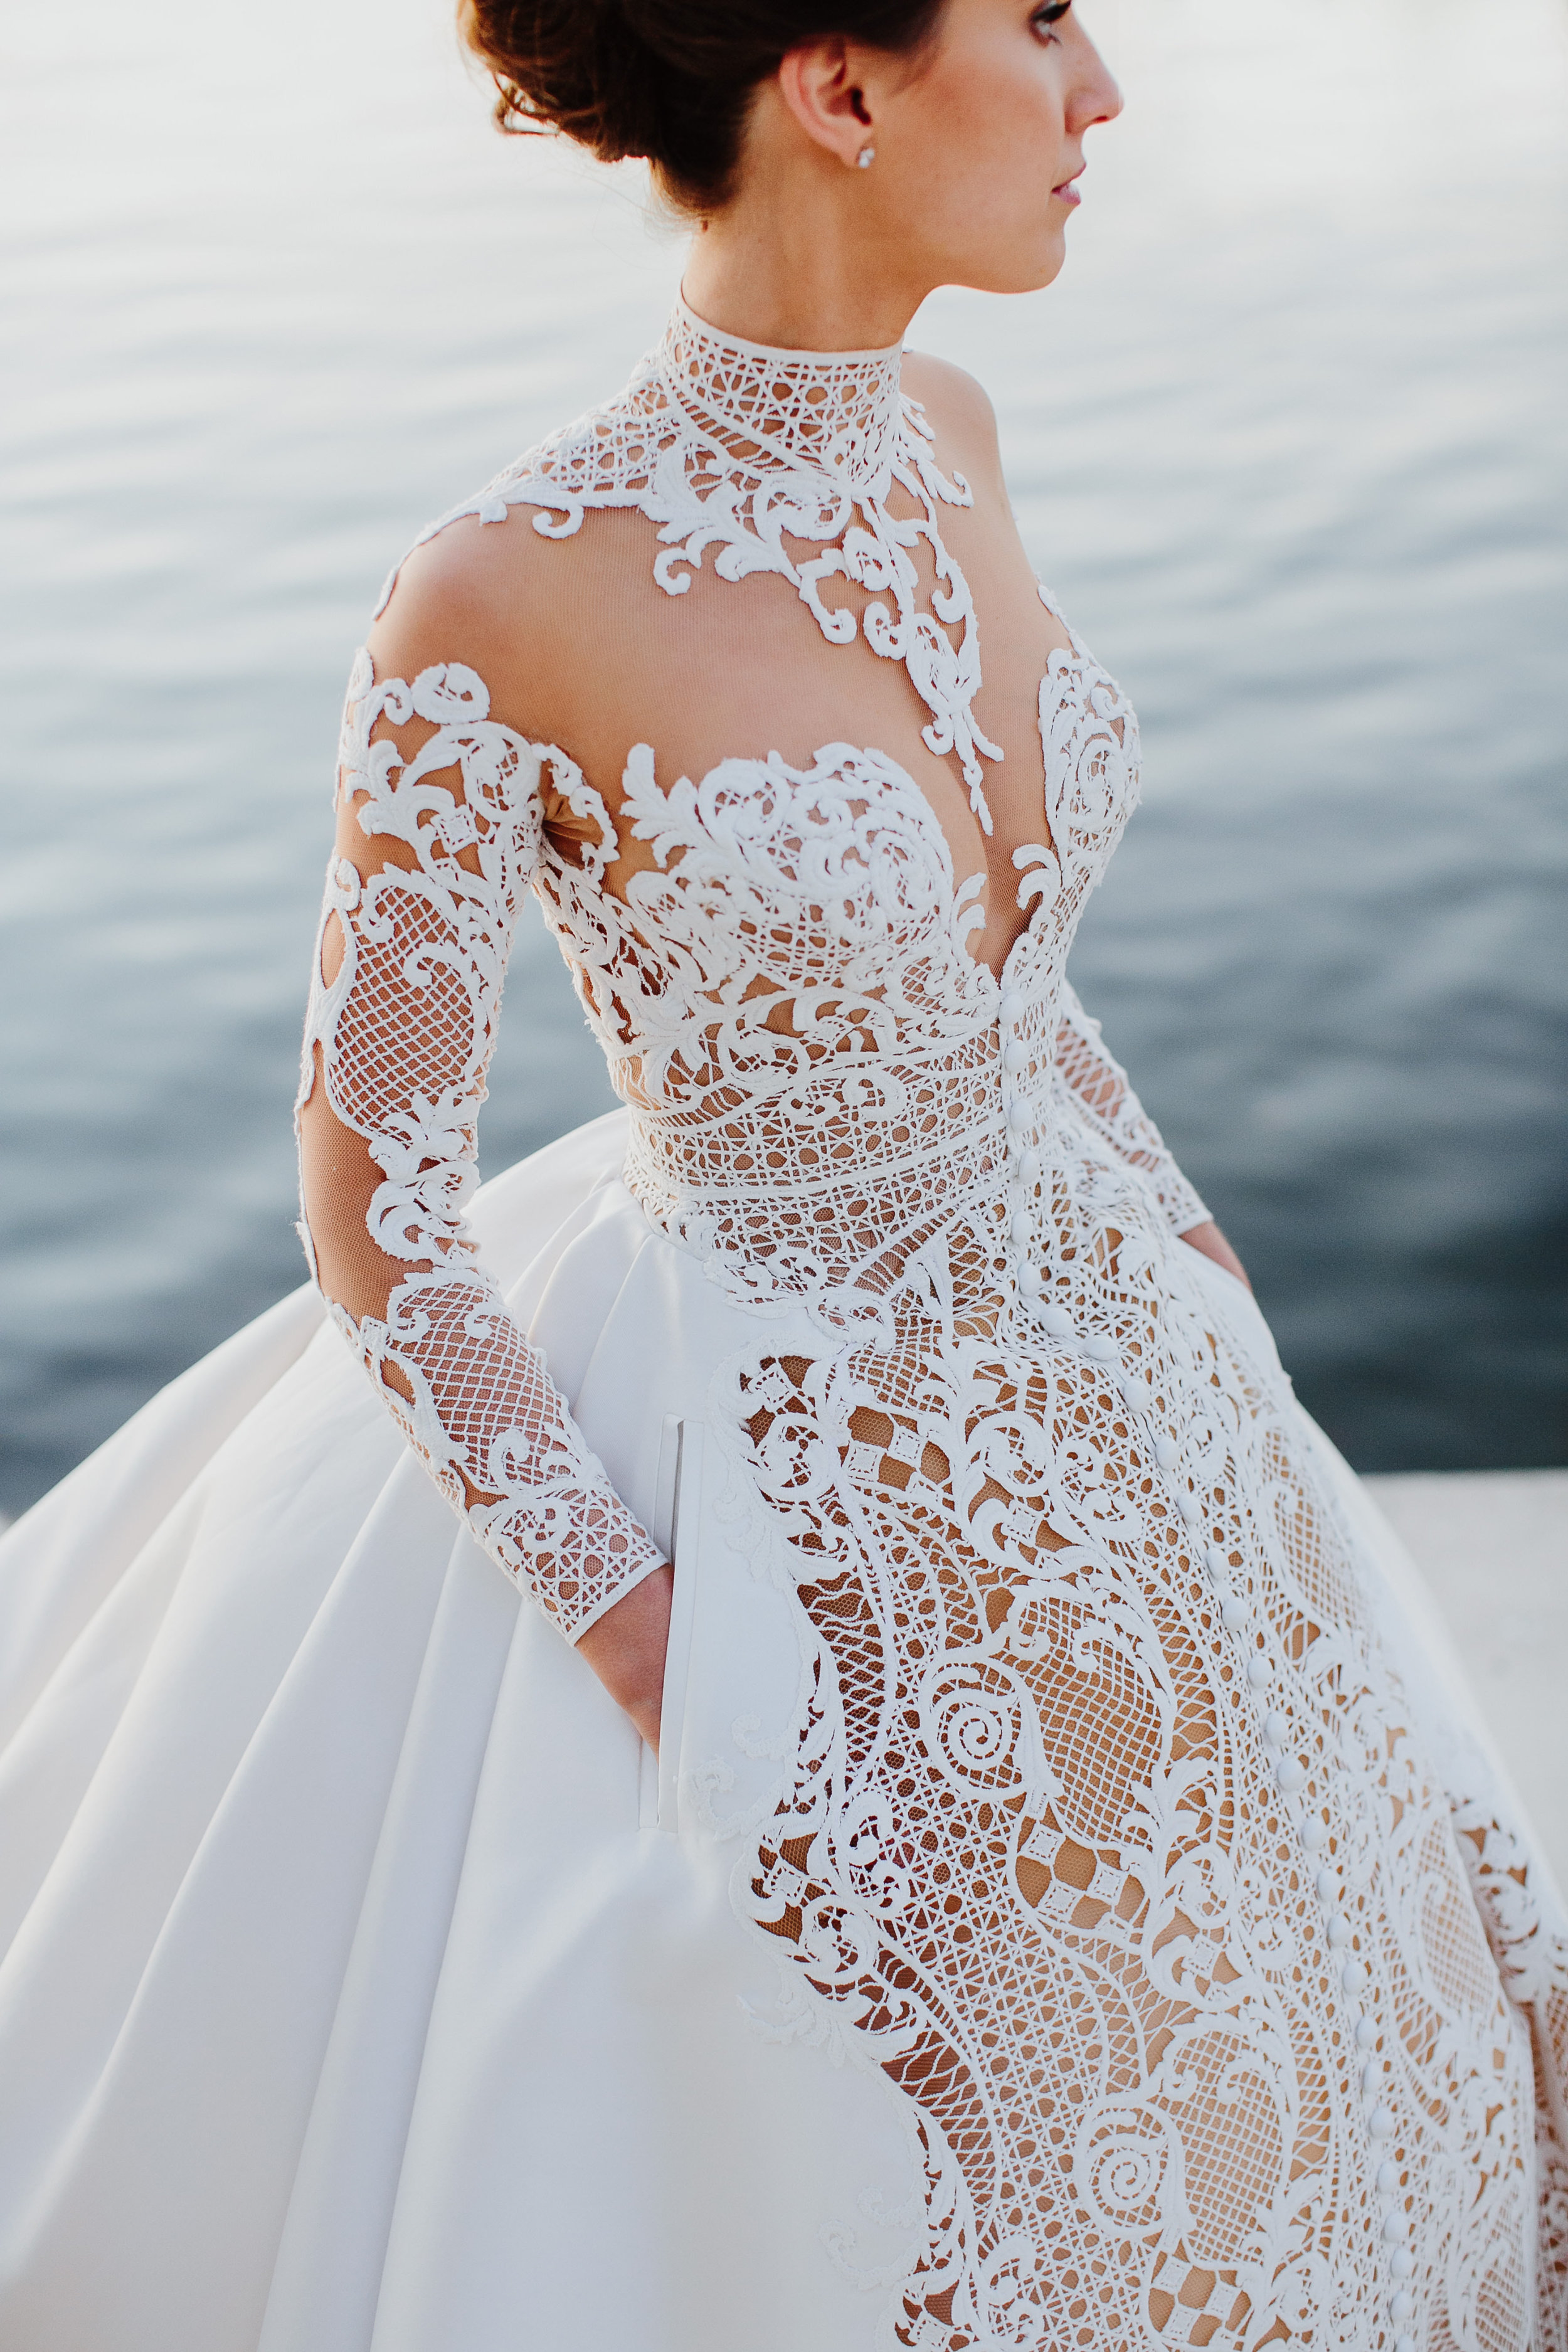 150523_justinaaron_wedding_bianca_ruben_P-551.JPG